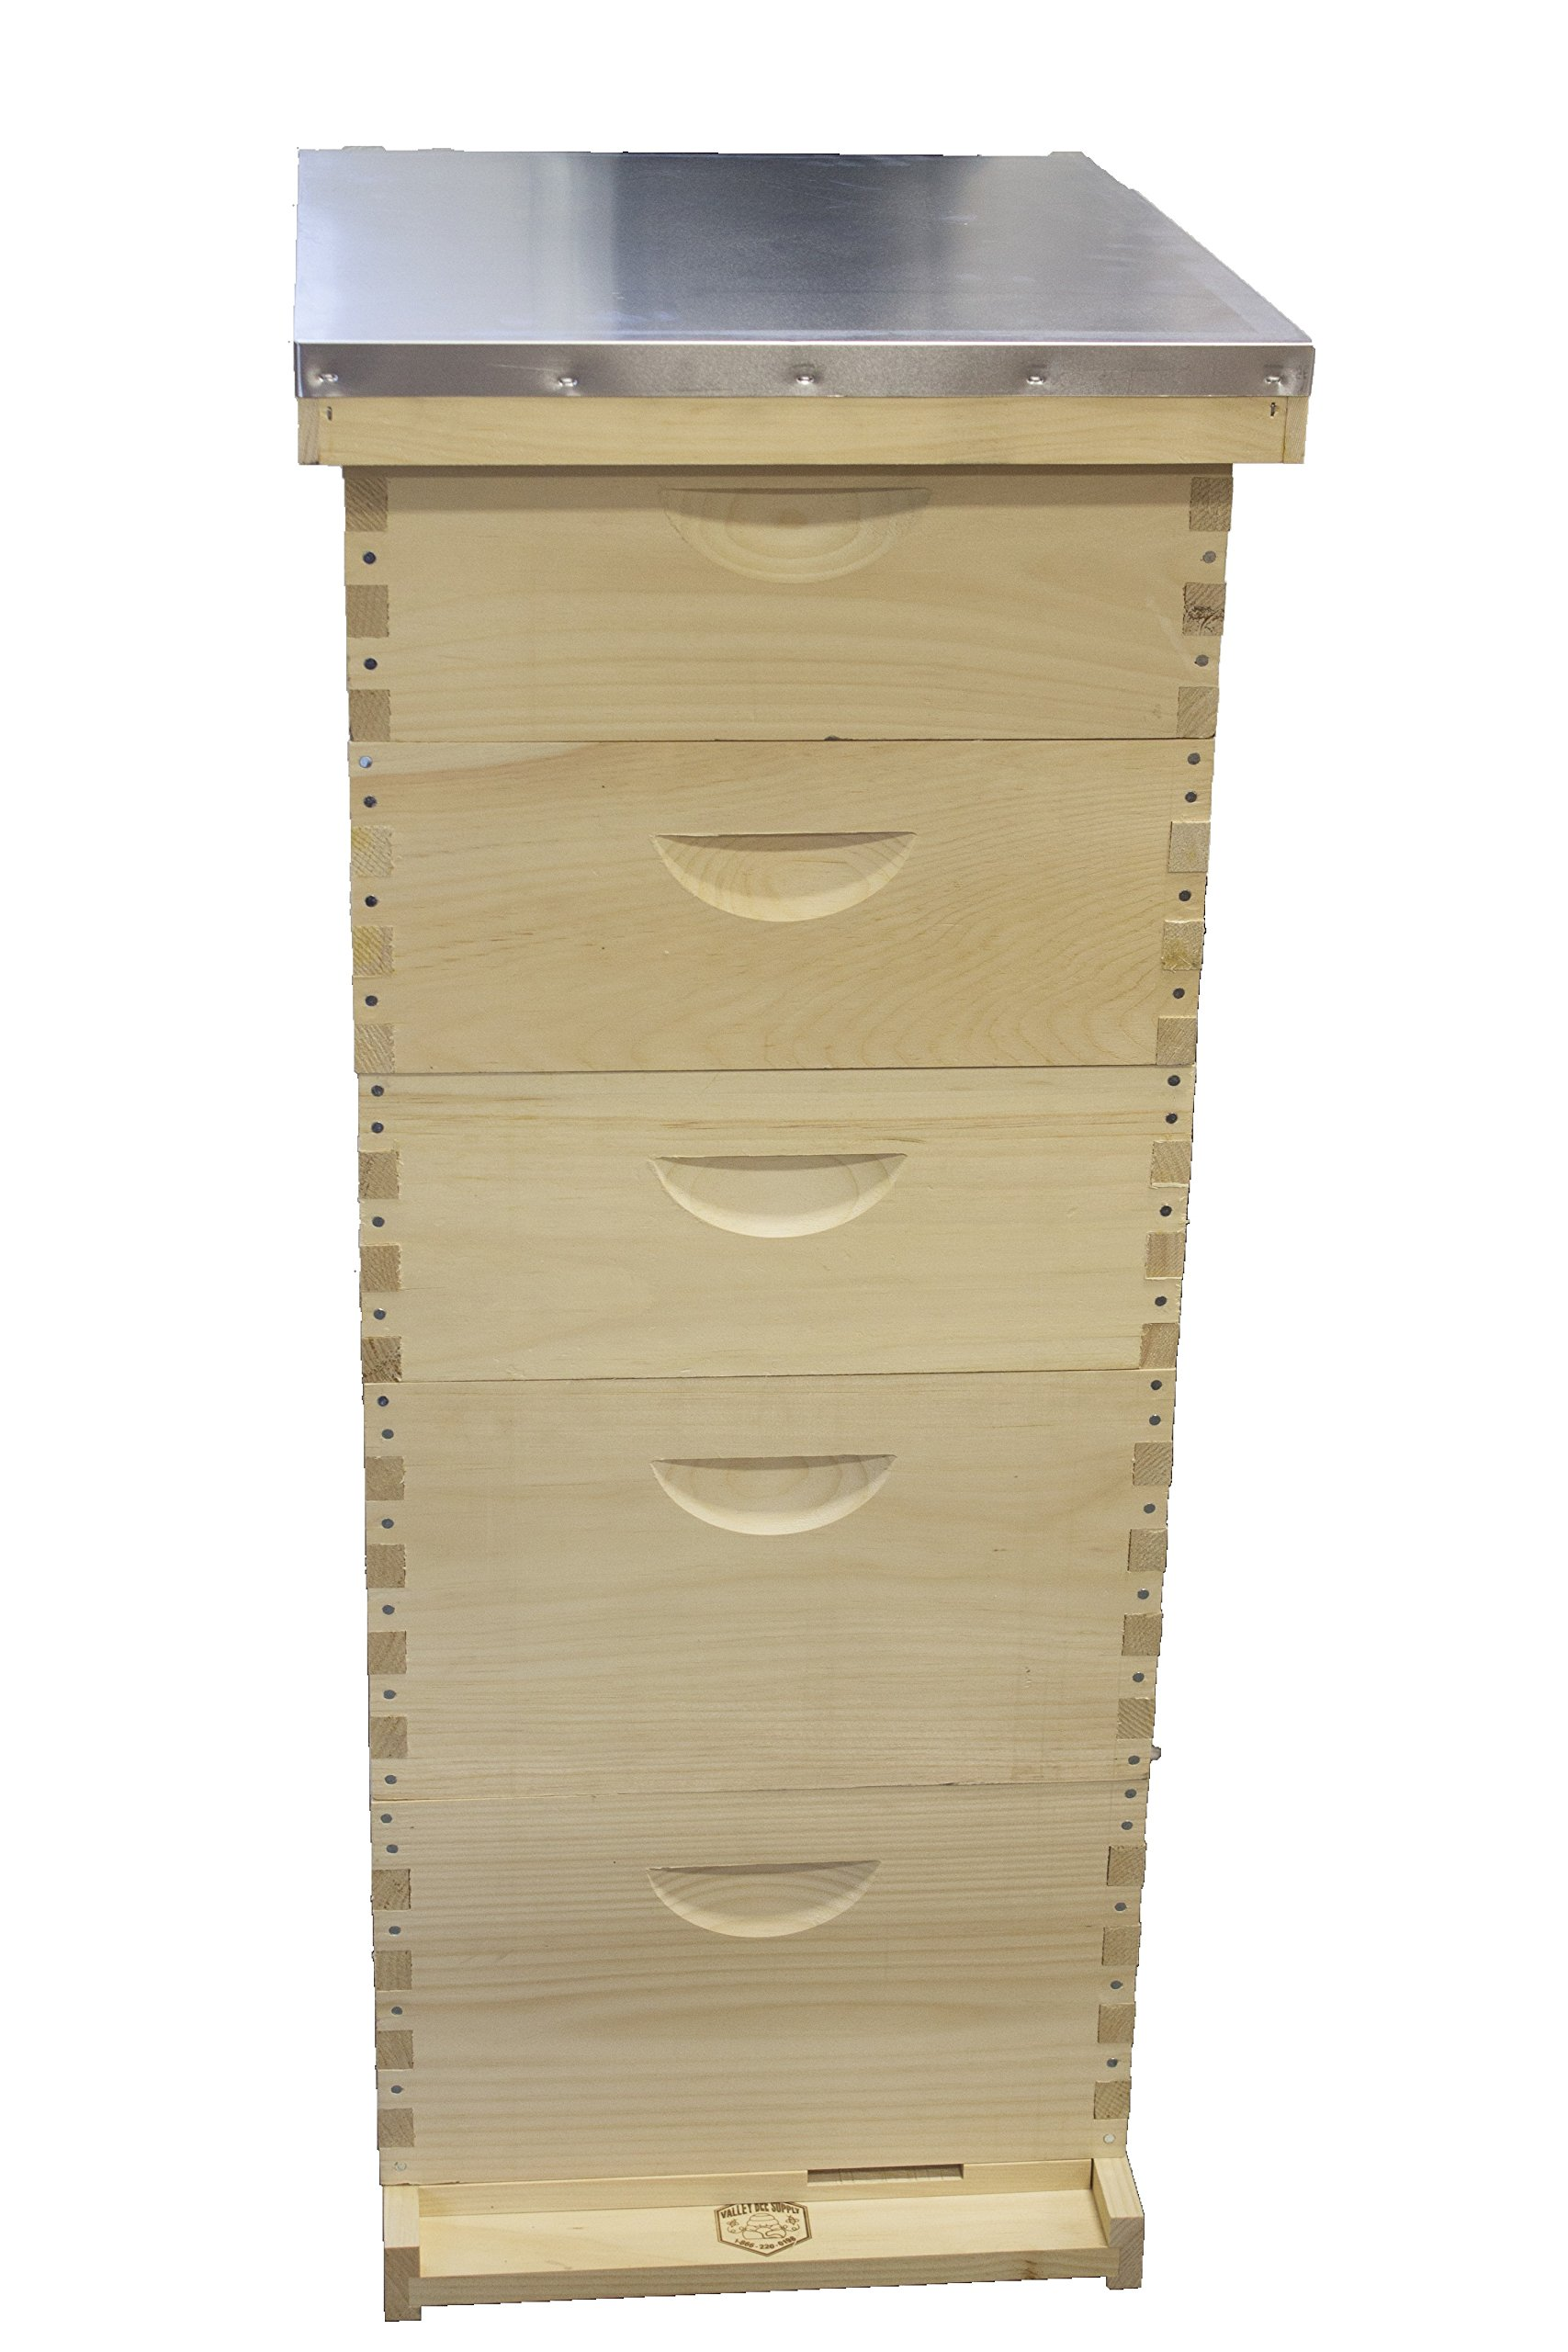 Bee Hive (10-Frame)